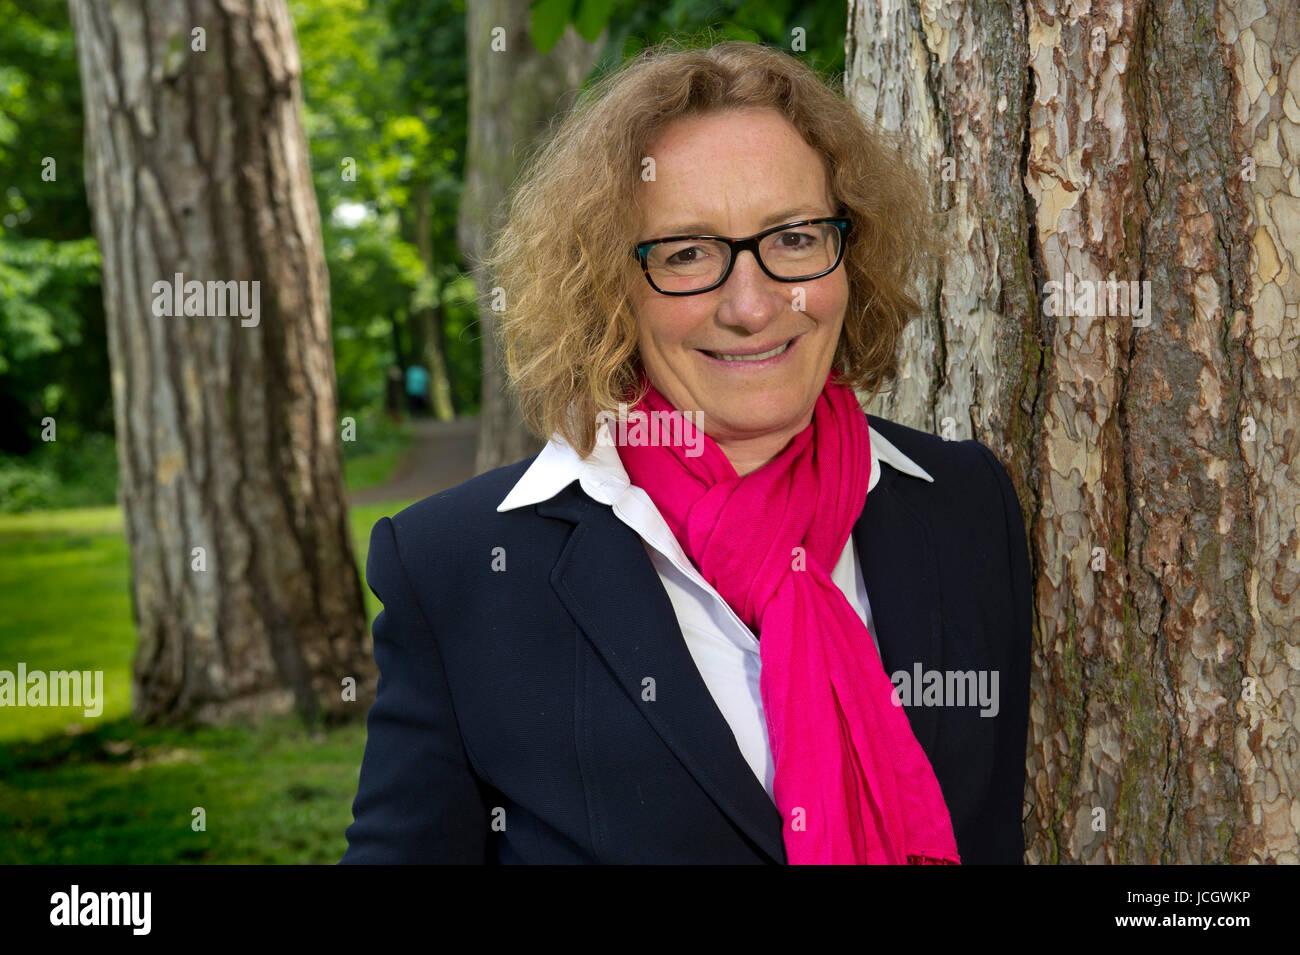 Juliet Davenport, CEO of Good Energy, a green energy supplier in Chippenham, Wiltshire, UK. - Stock Image